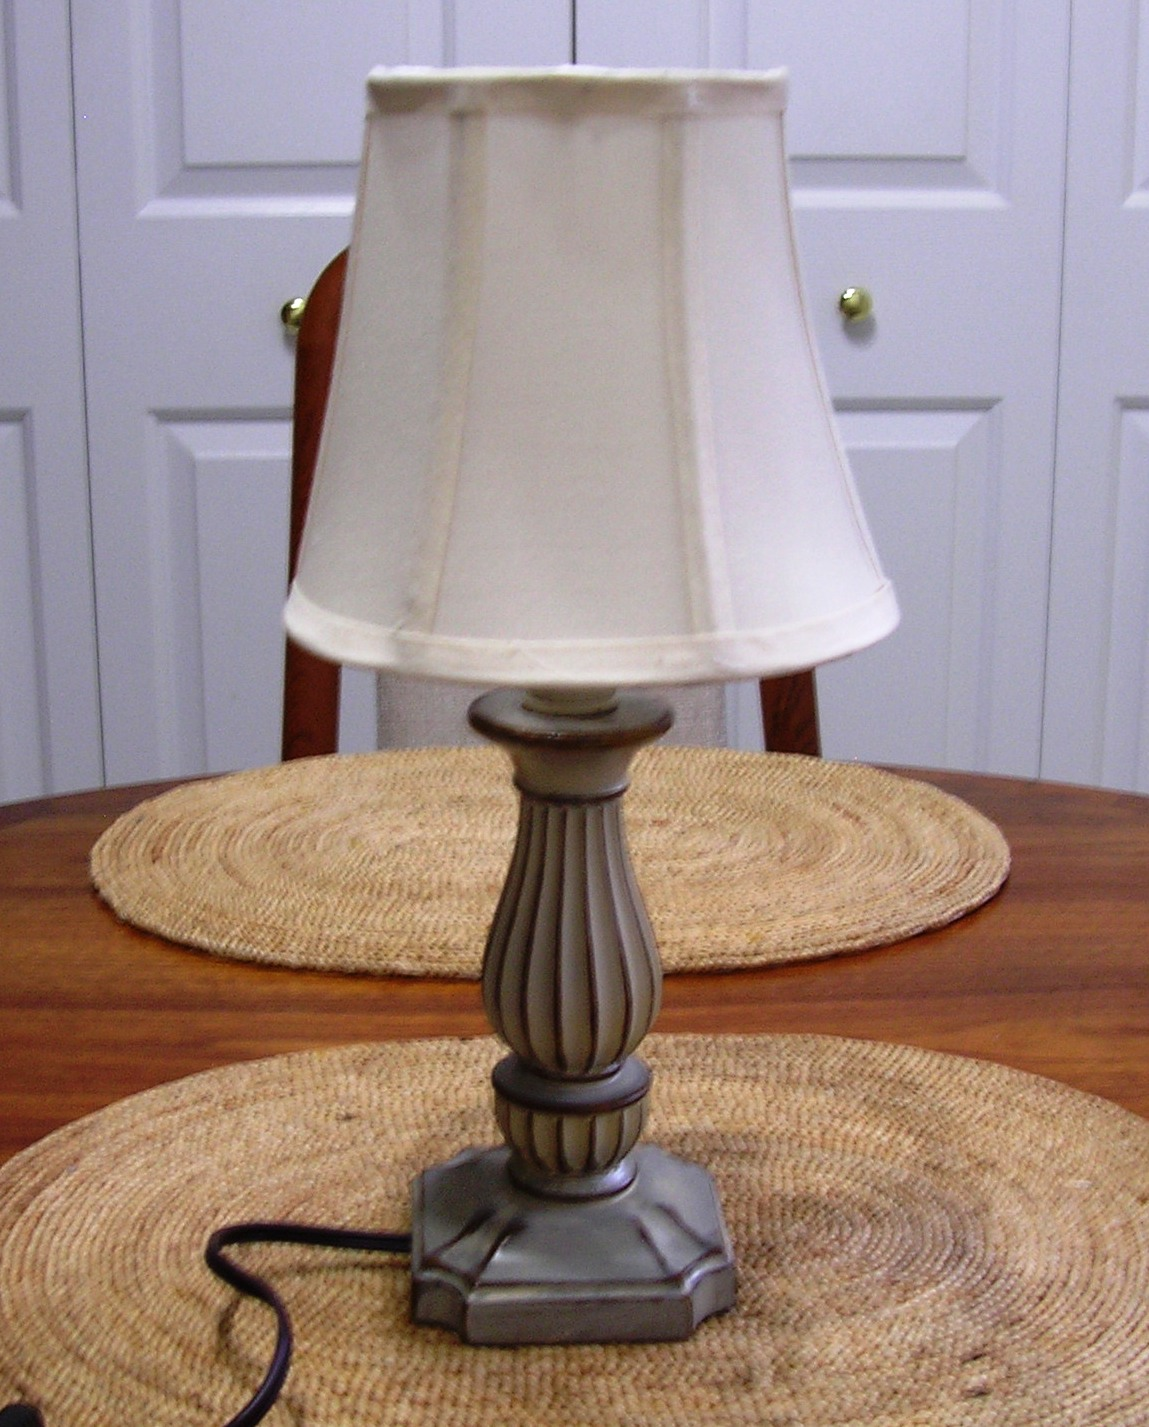 Living prepared 12 volt led lamp update 3 23 12 12 volt led lamp update 3 23 12 geotapseo Images